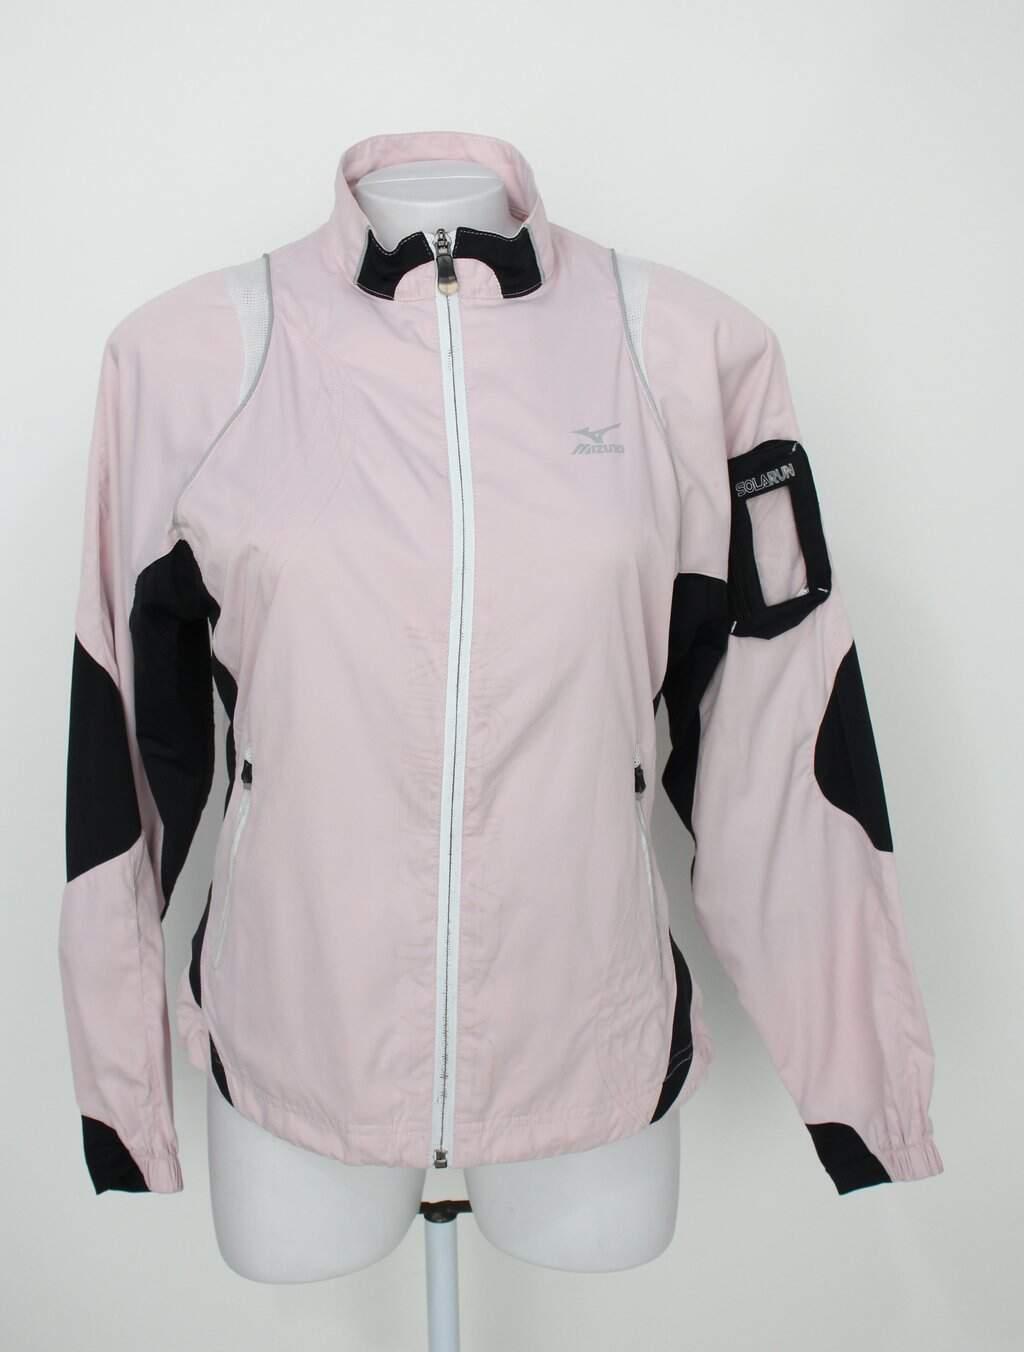 Jaqueta Esportiva Mizuno Feminina Rosa E Preta